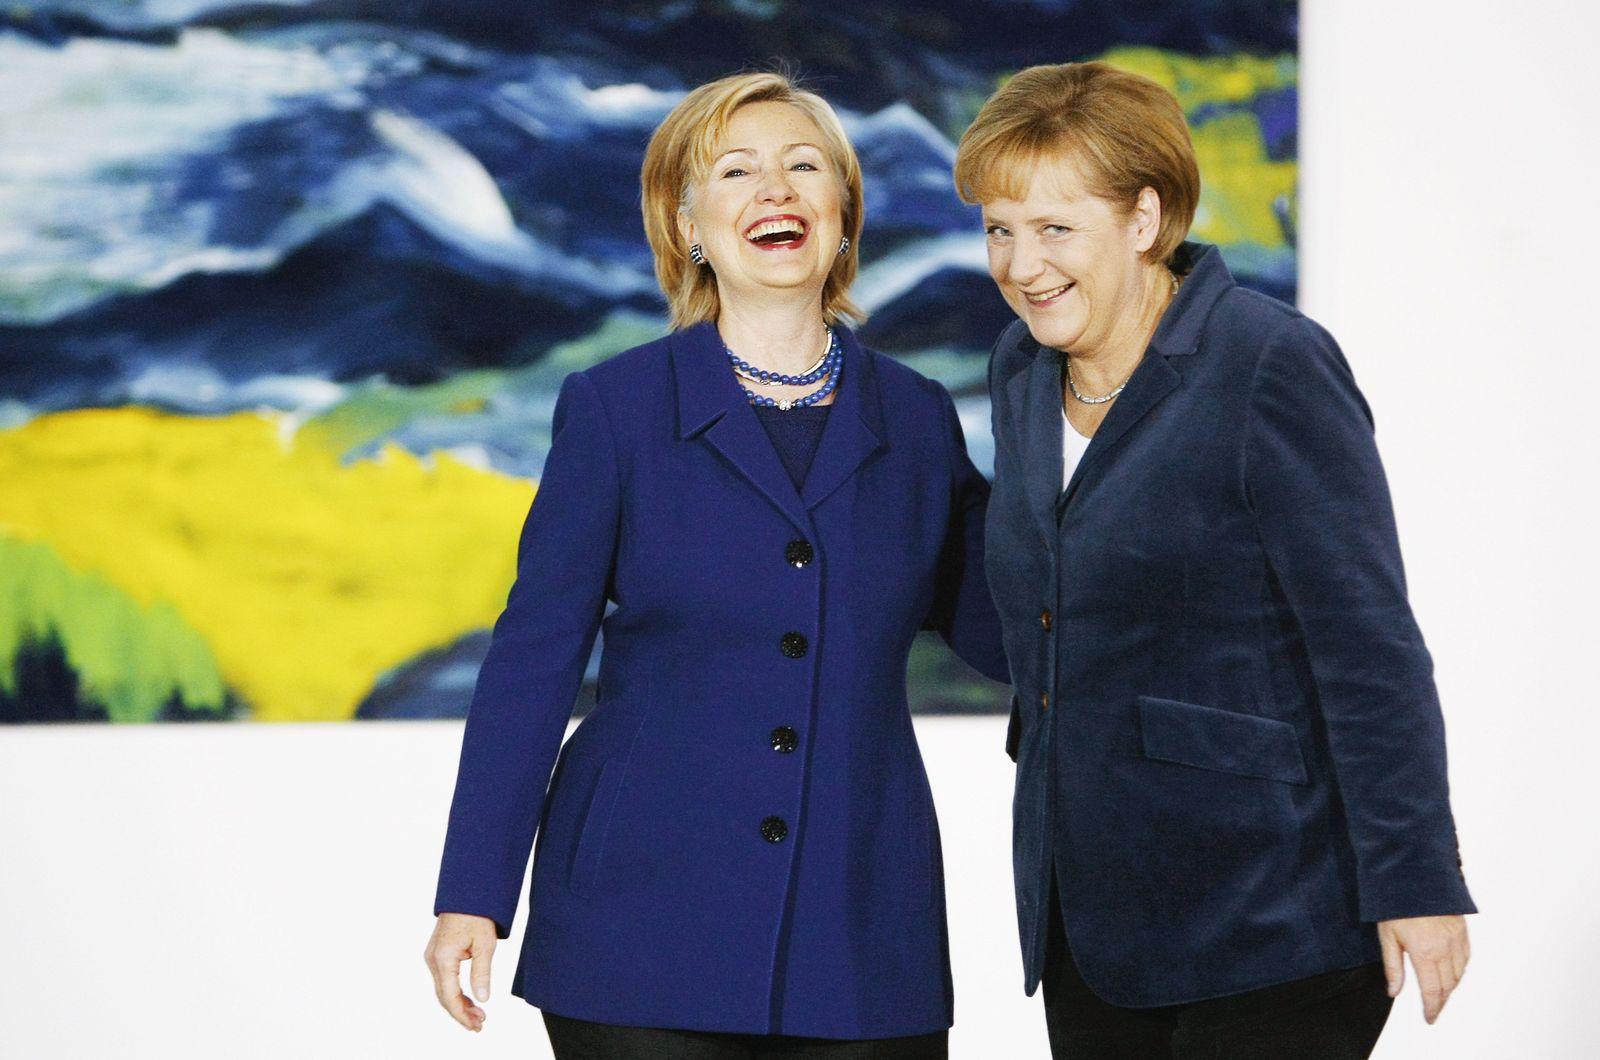 Angela Merkel / Hillary Clinton